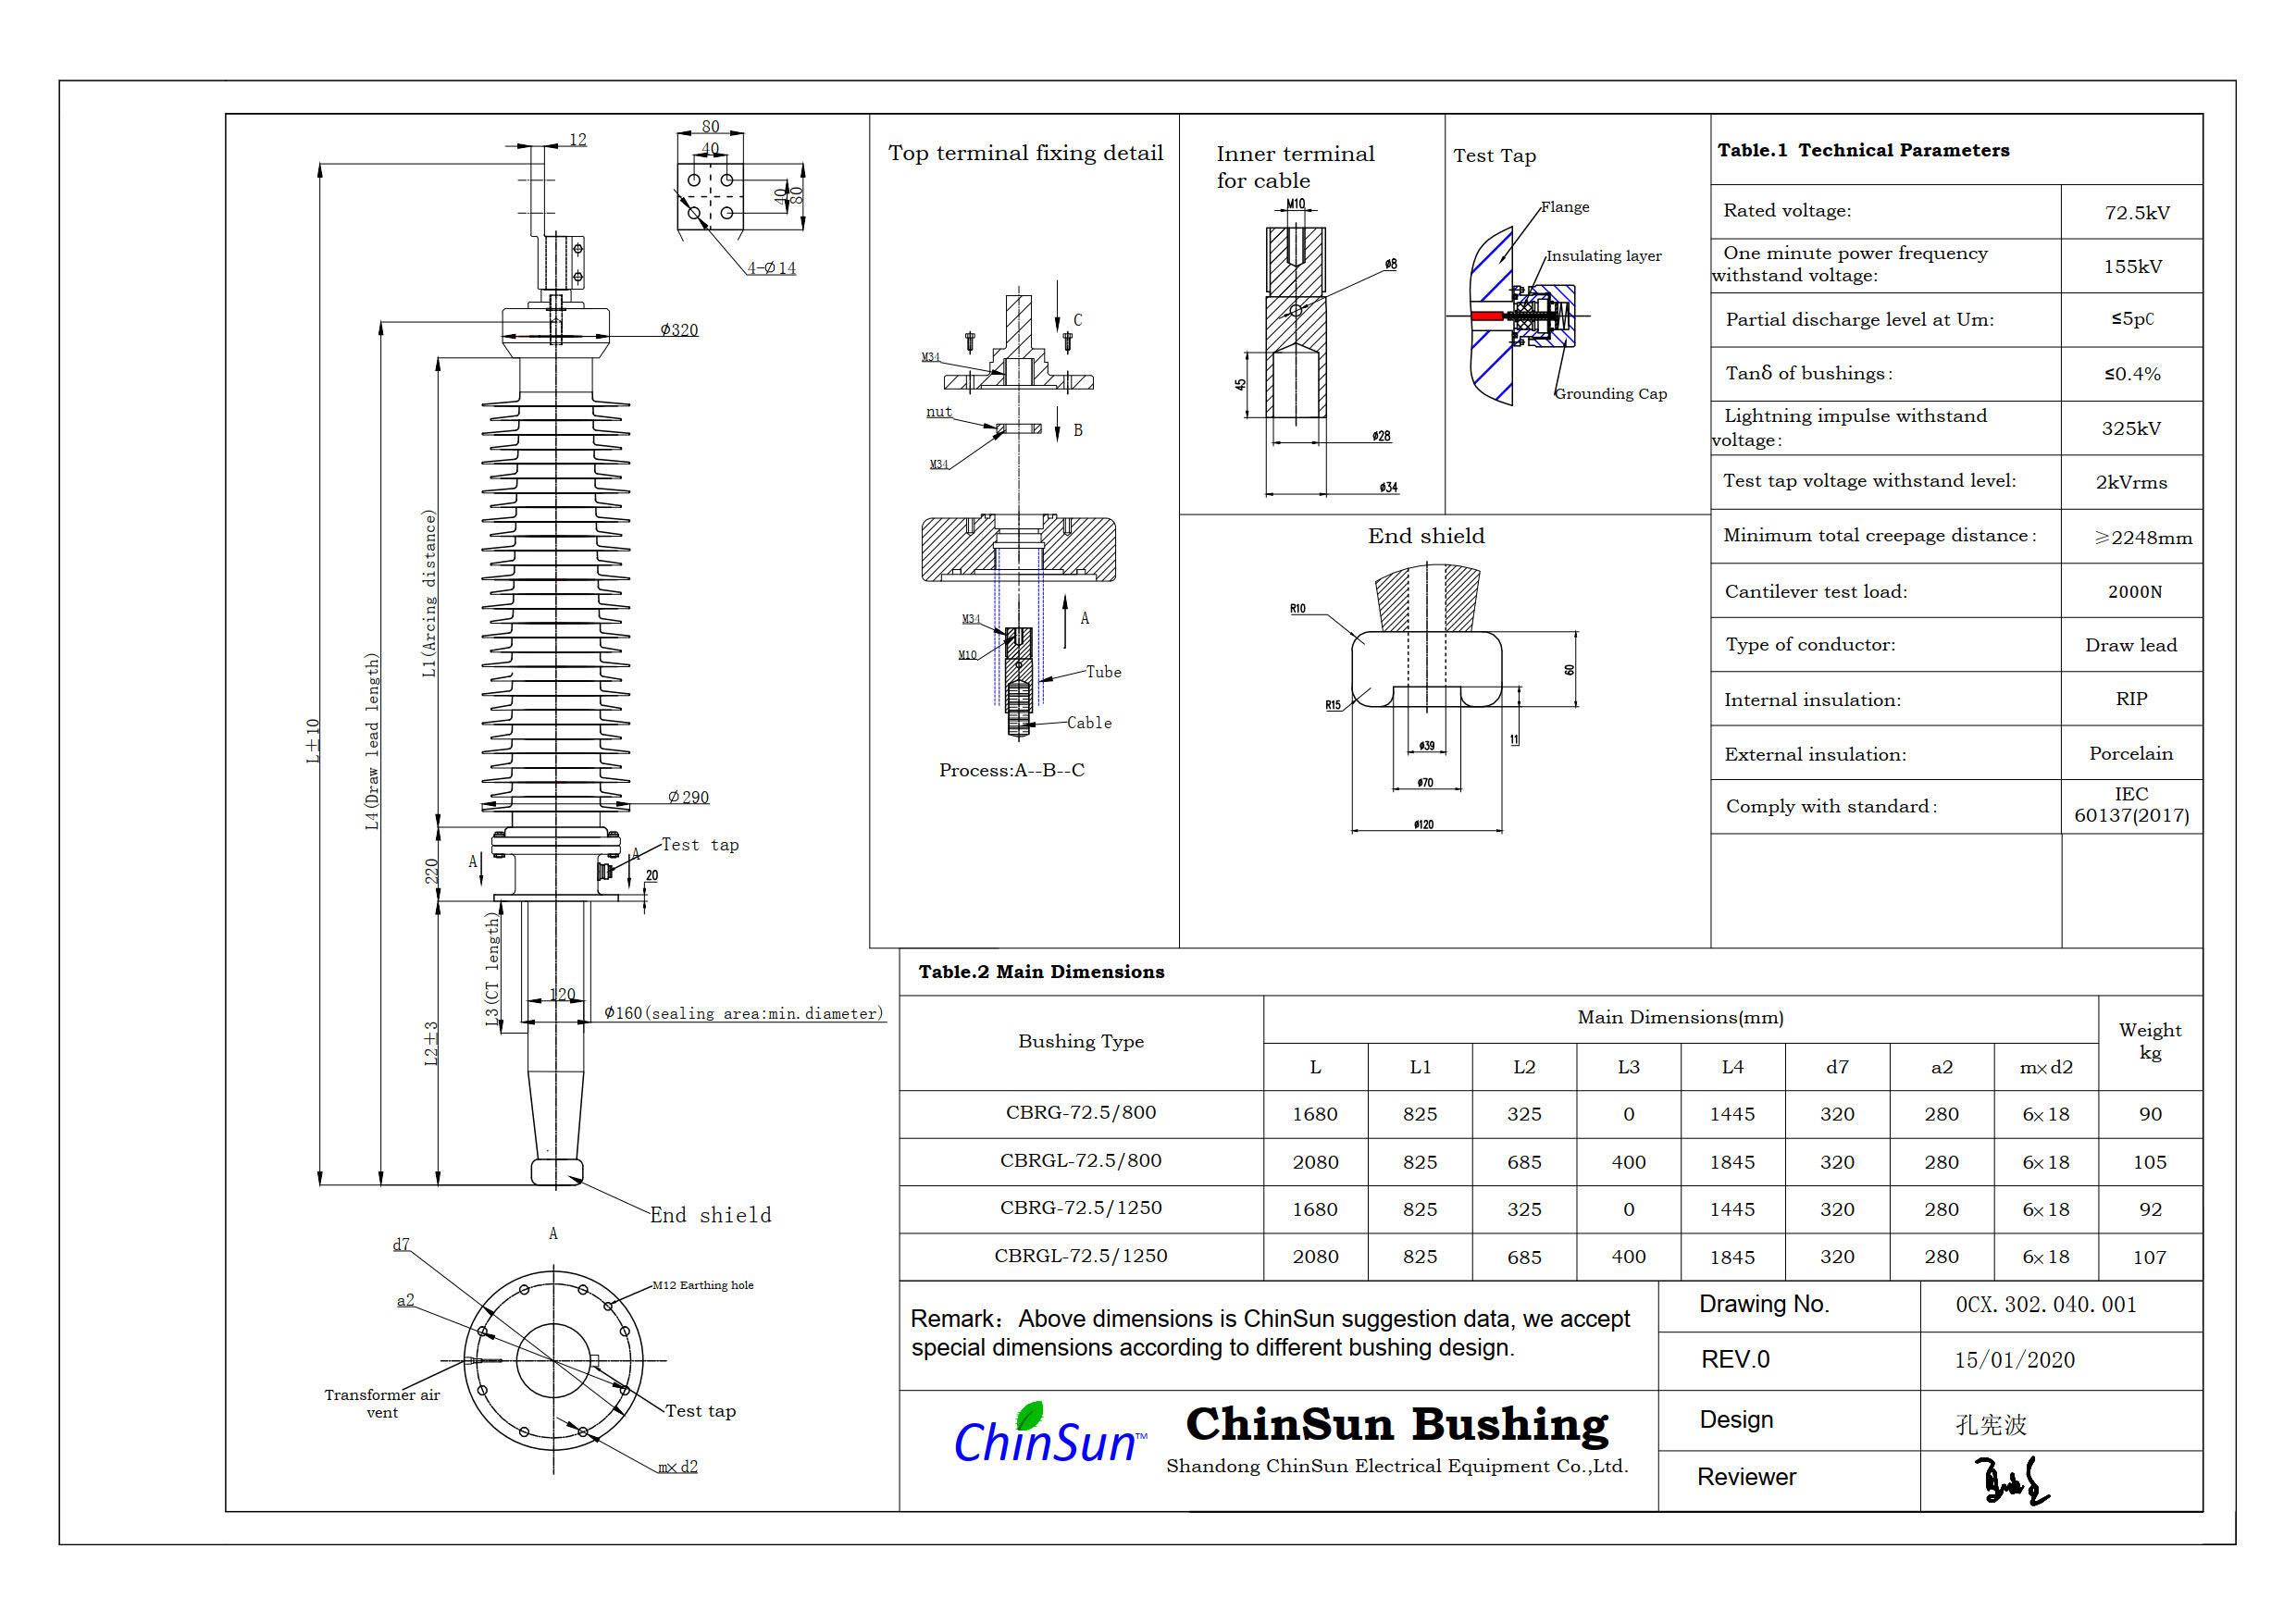 Drawing-transformer bushing-72.5kV_Porcelain-DL-ChinSun